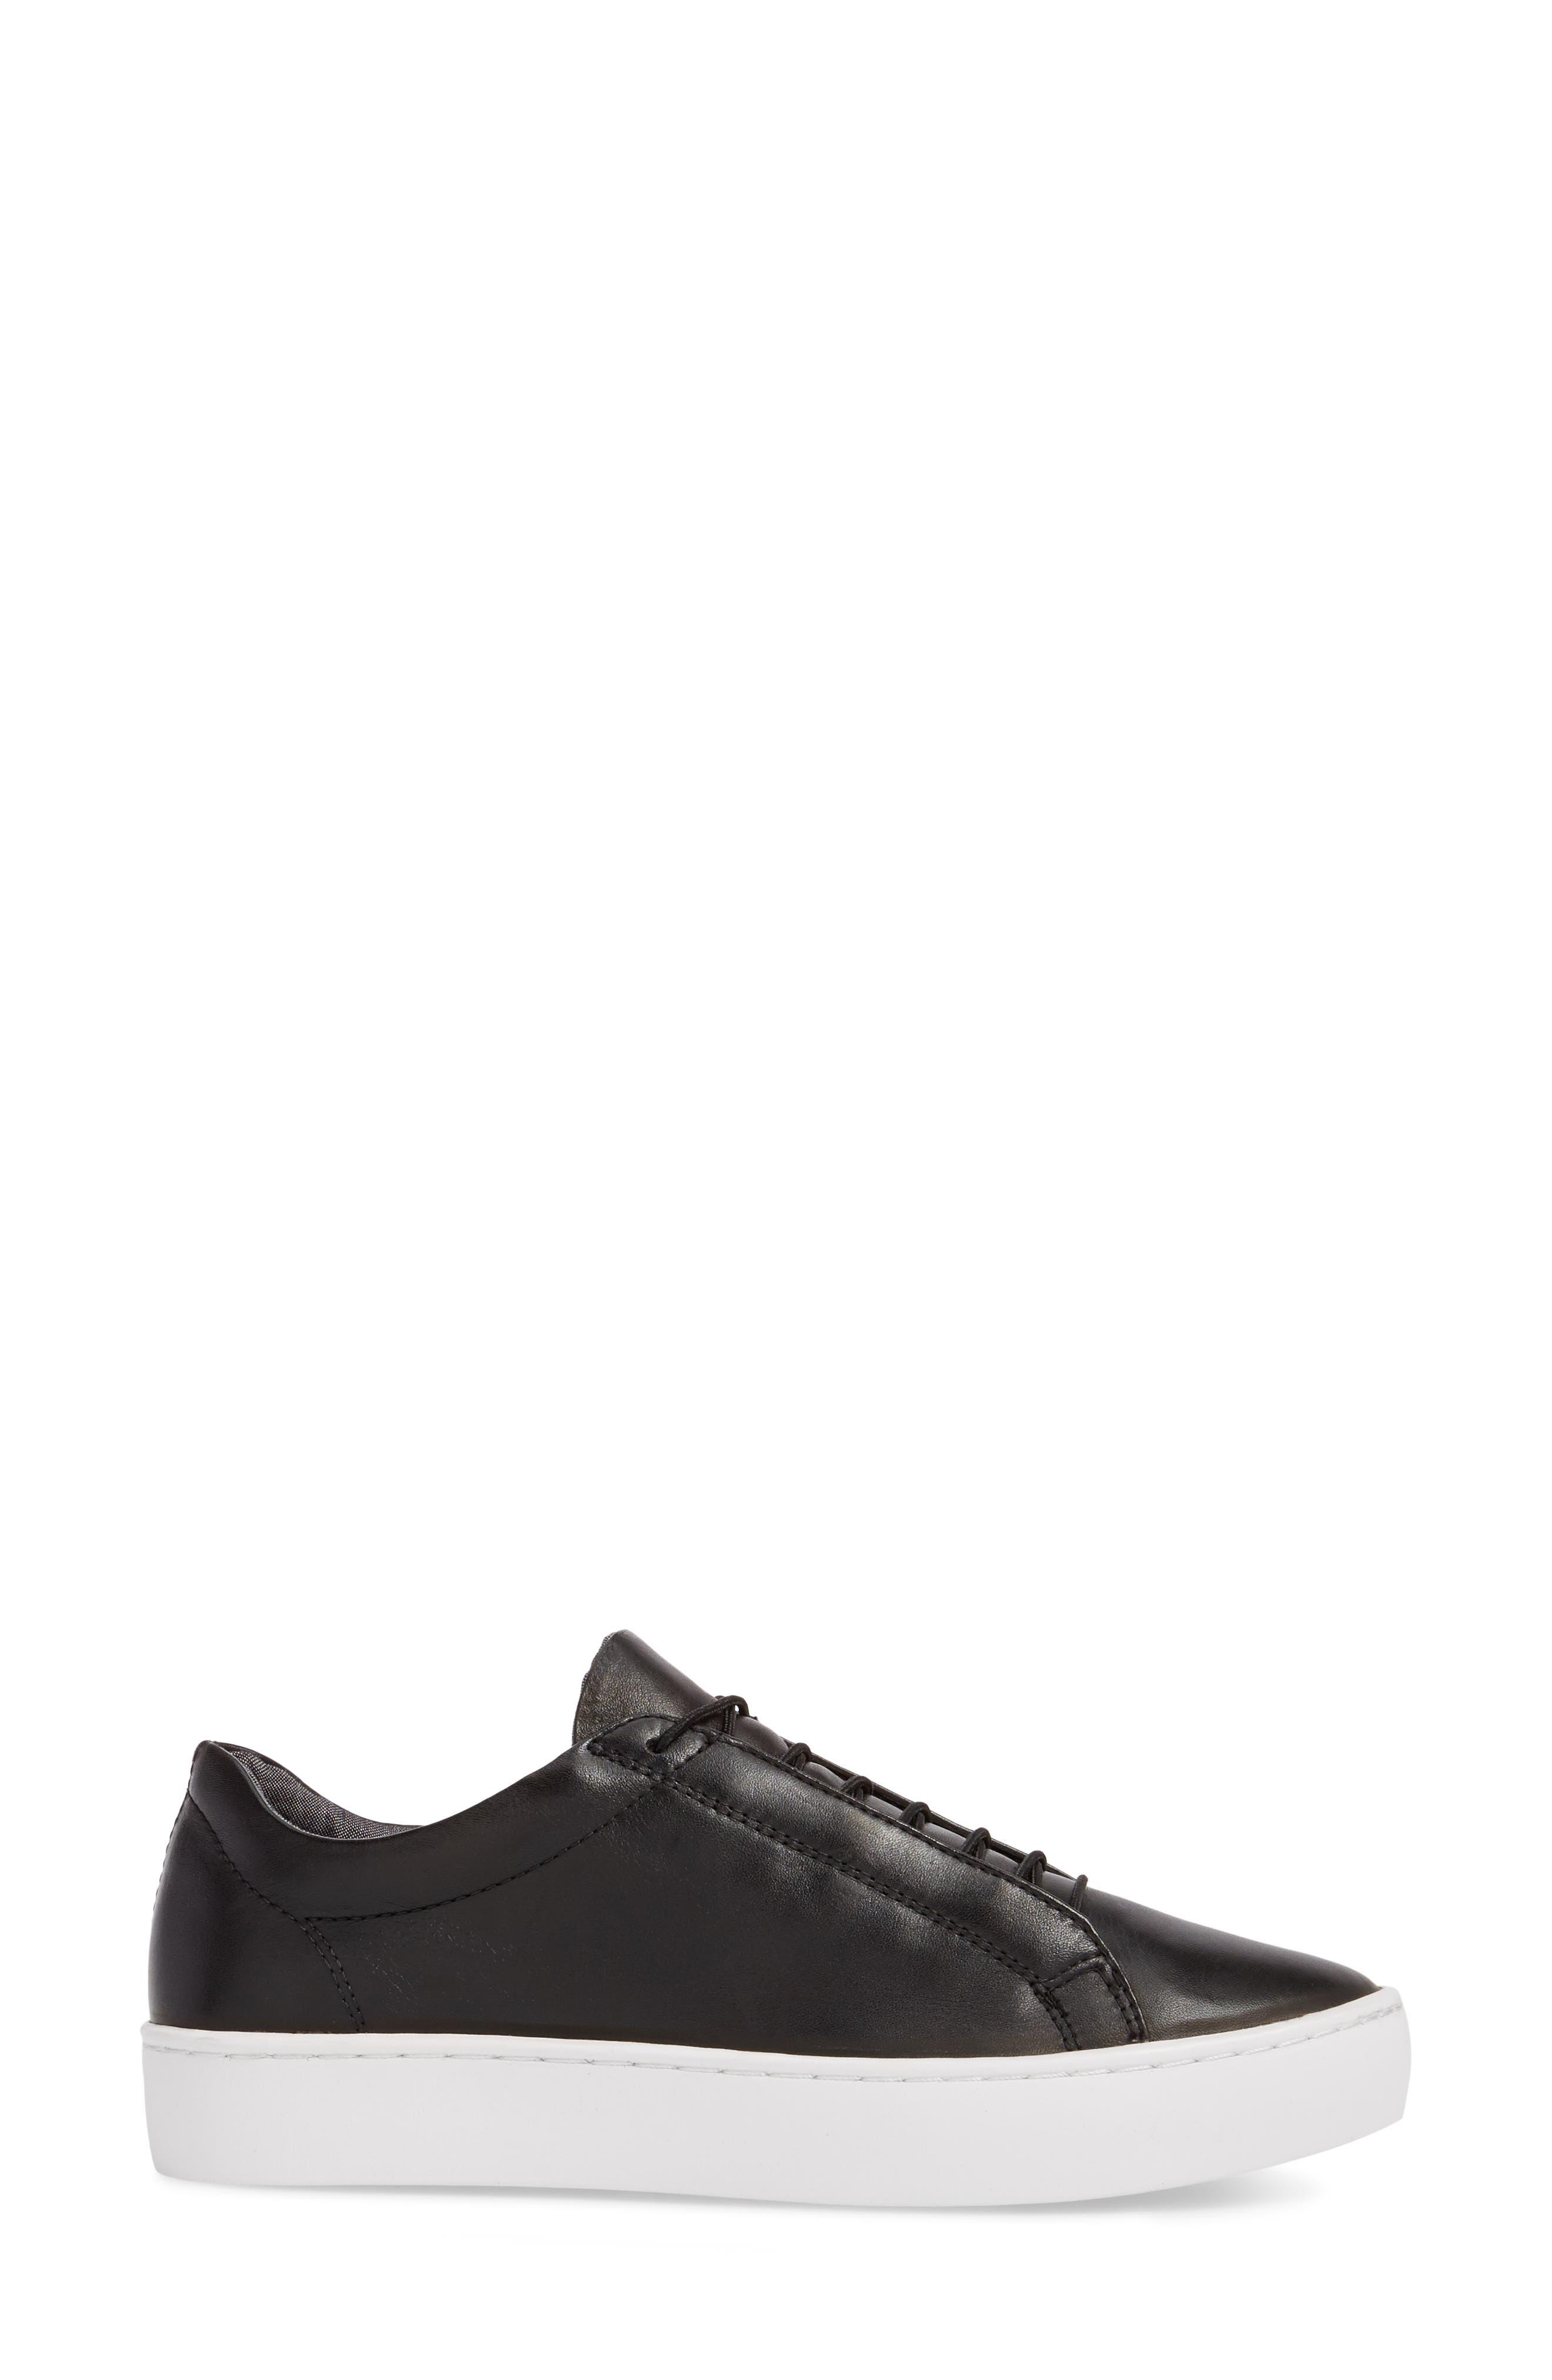 Zoe Sneaker,                             Alternate thumbnail 3, color,                             BLACK LEATHER